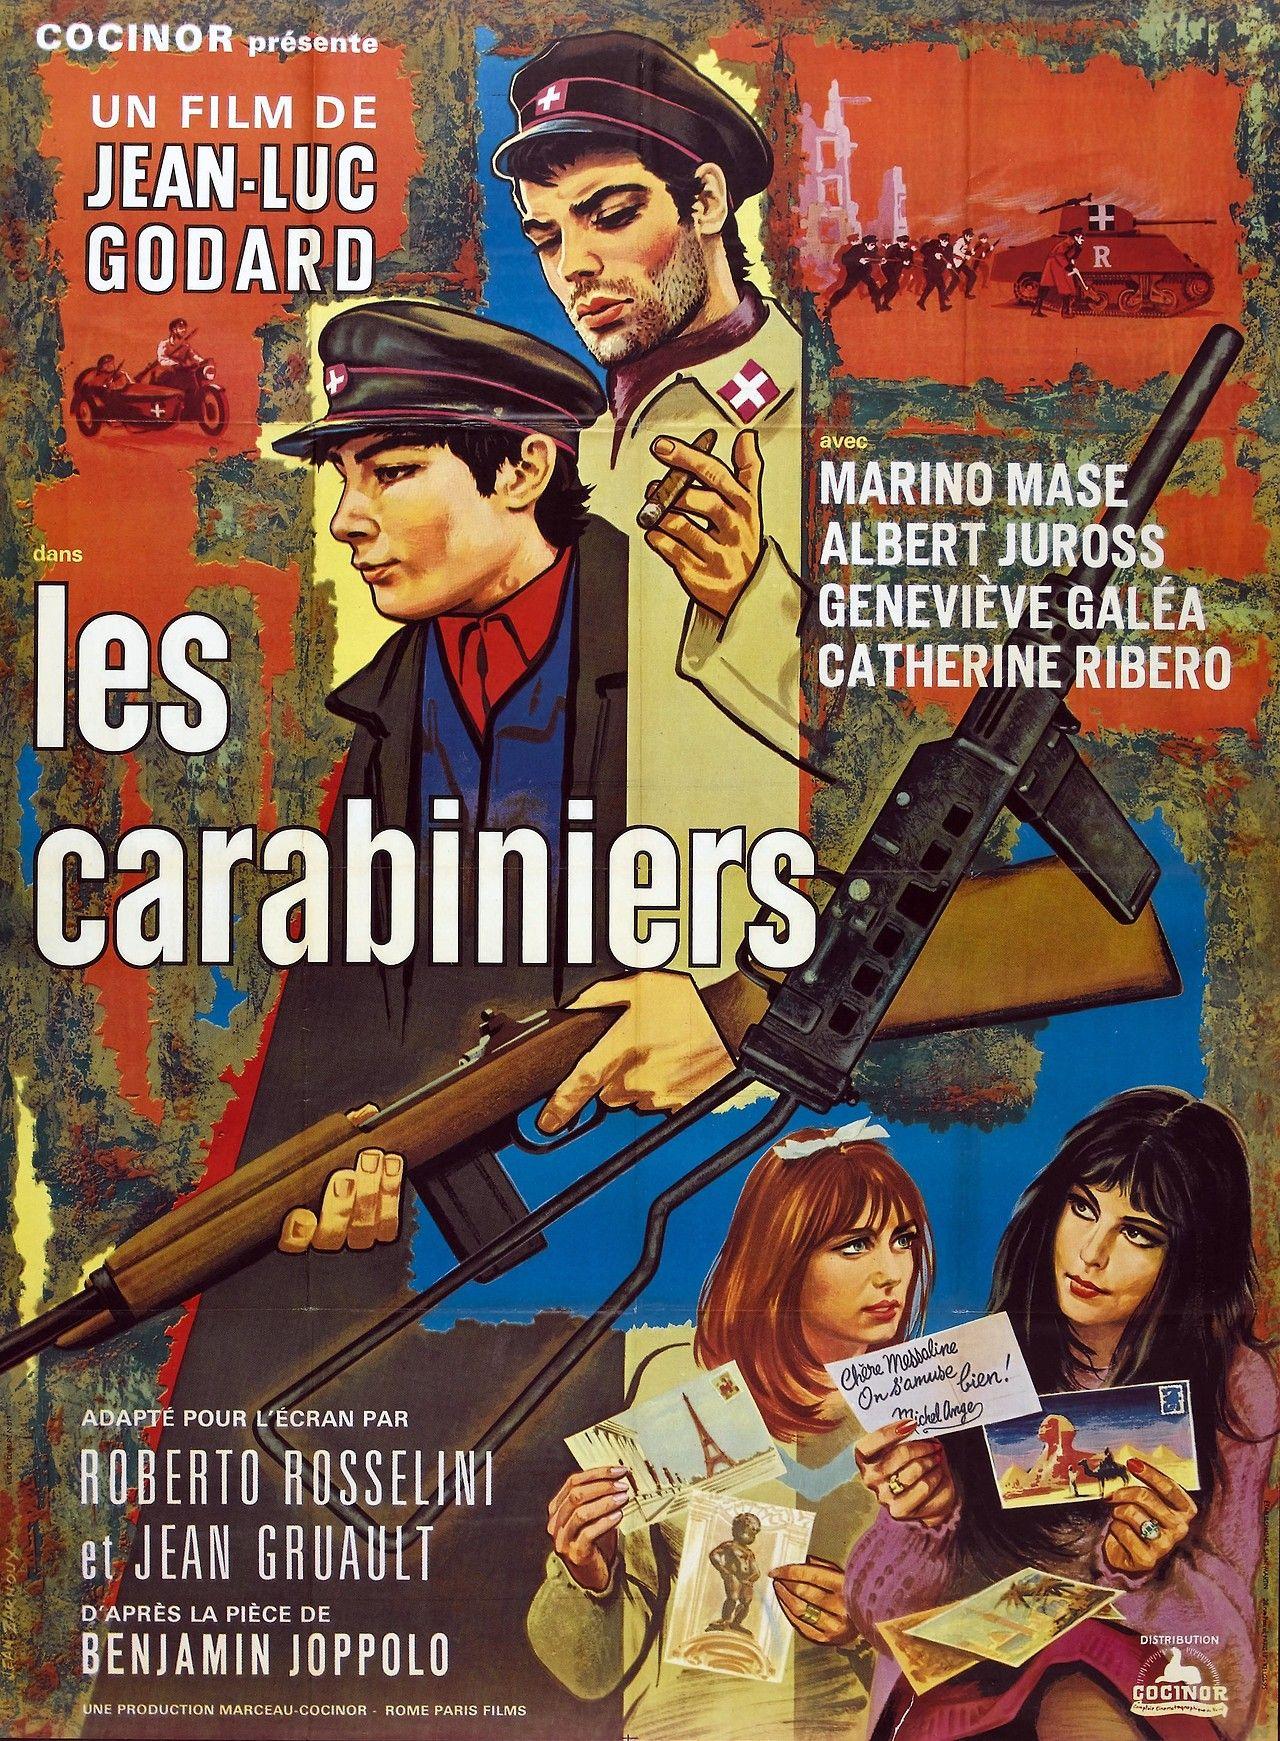 LES CARABINIERS. The Carabineers (1967)